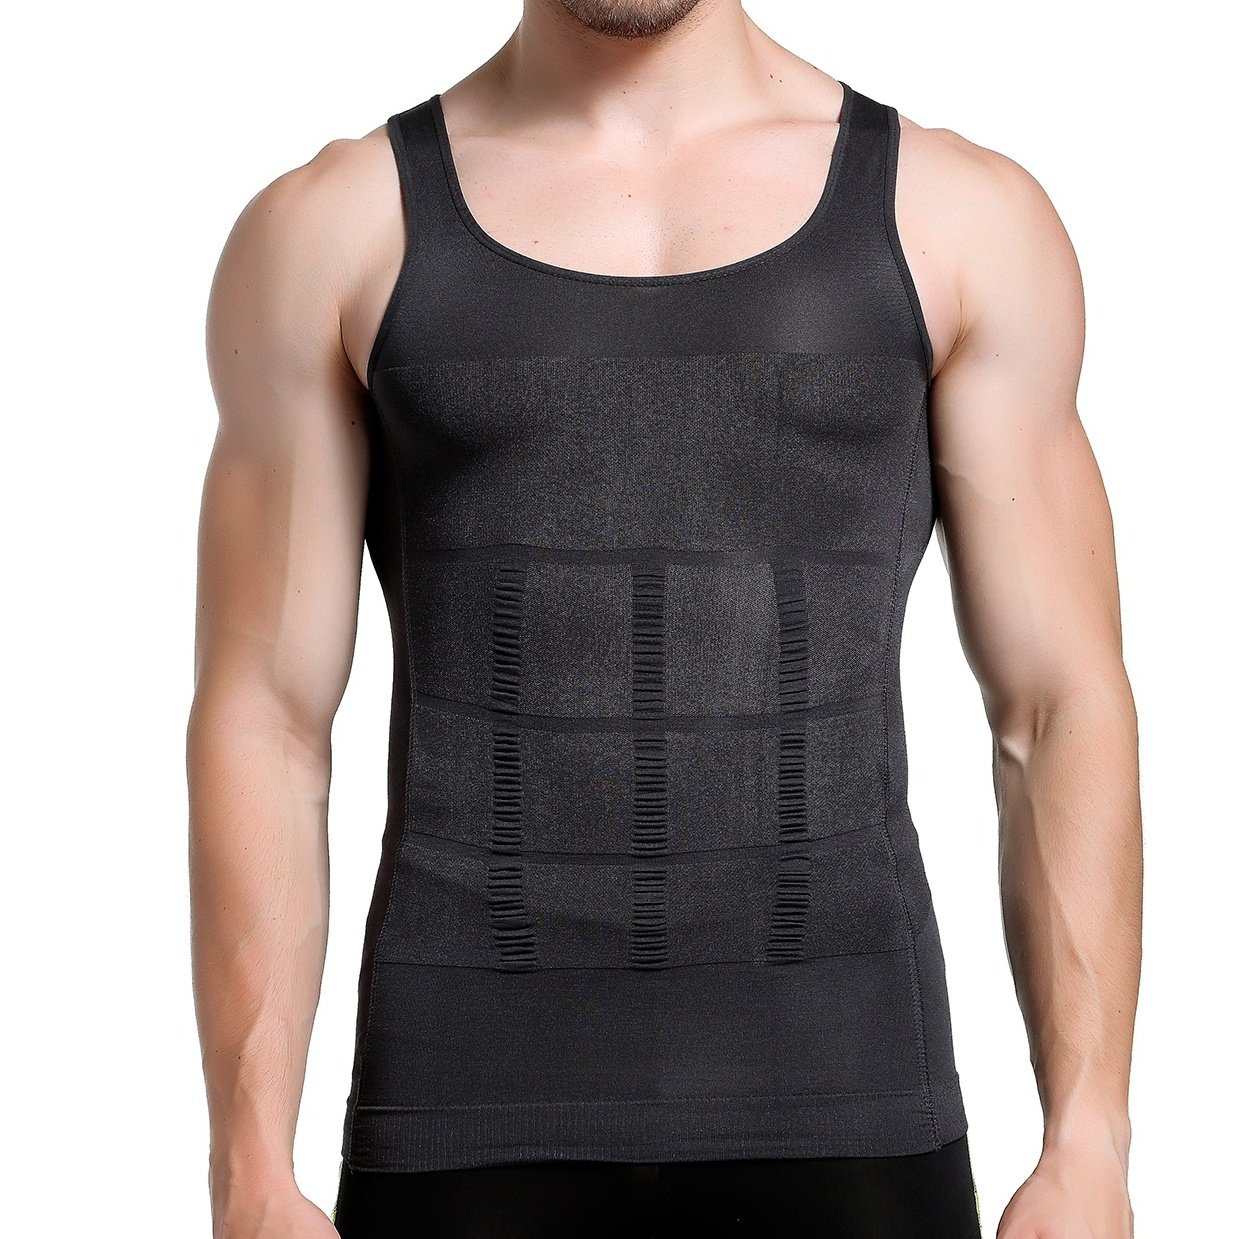 GKVK Mens Slimming Body Shaper Vest Shirt Abs Abdomen Slim,XL(chest size 106cm-110cm/42inches-44inches),Gray